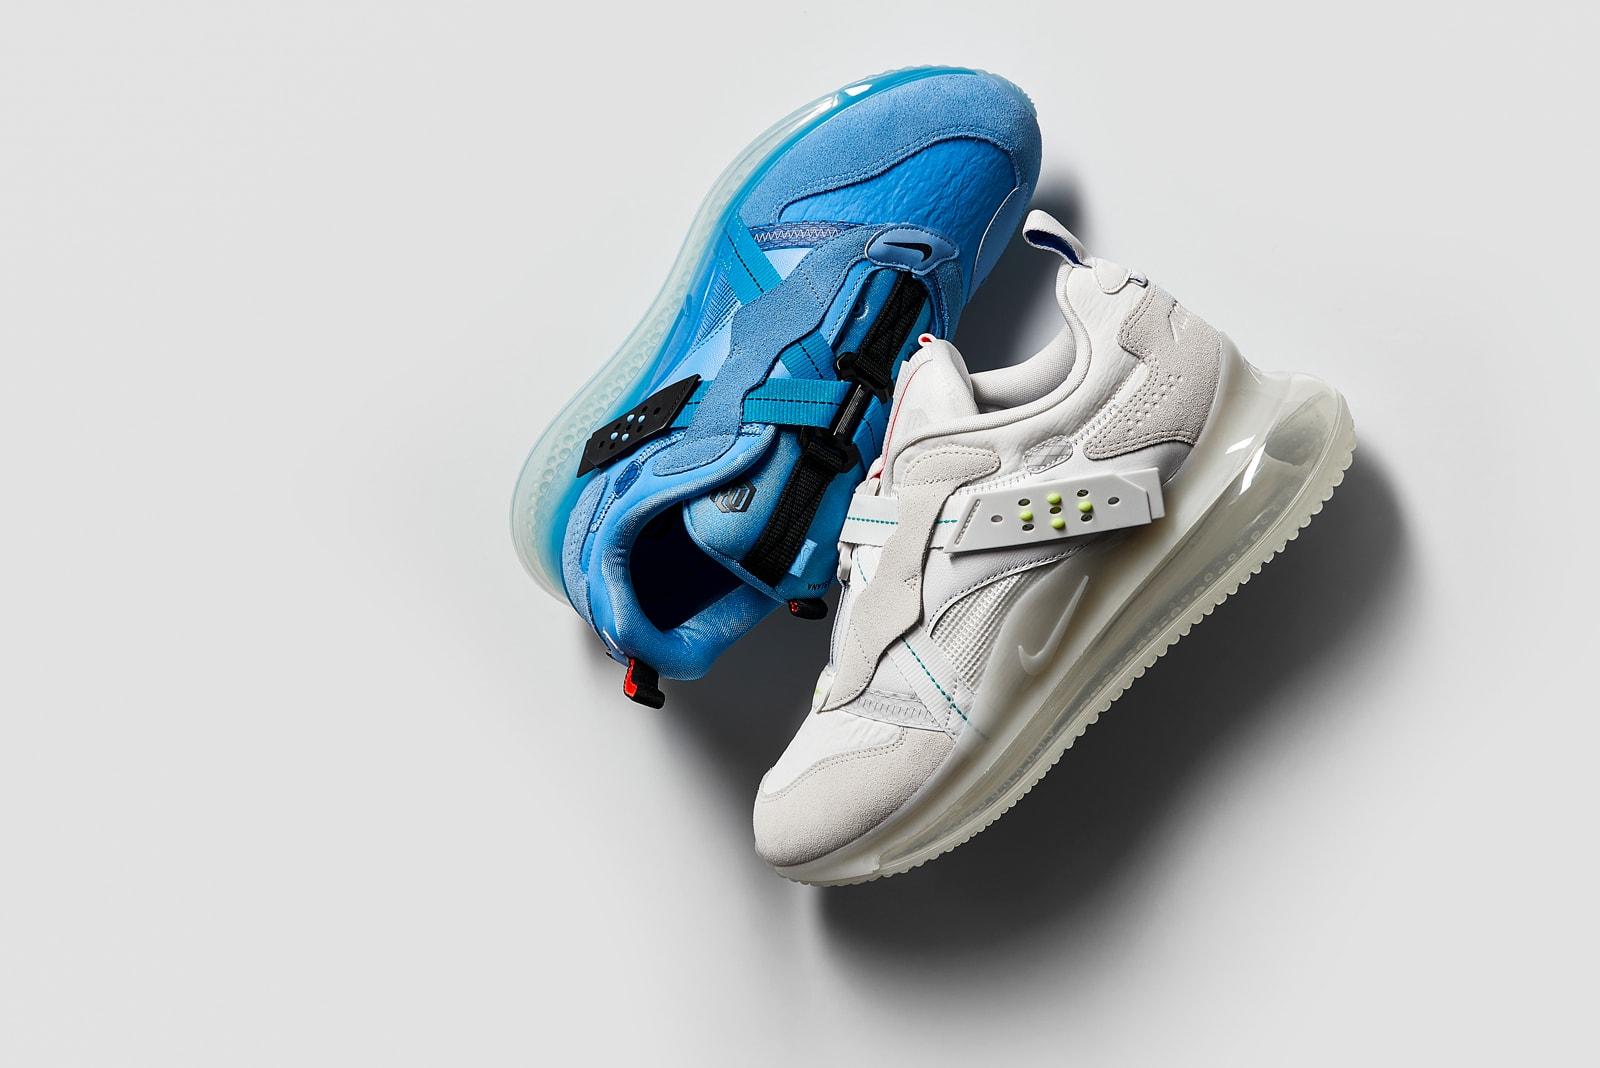 Nike x Odell Beckham Jr Air Max 720 - DA4155-100 & DA4155-400